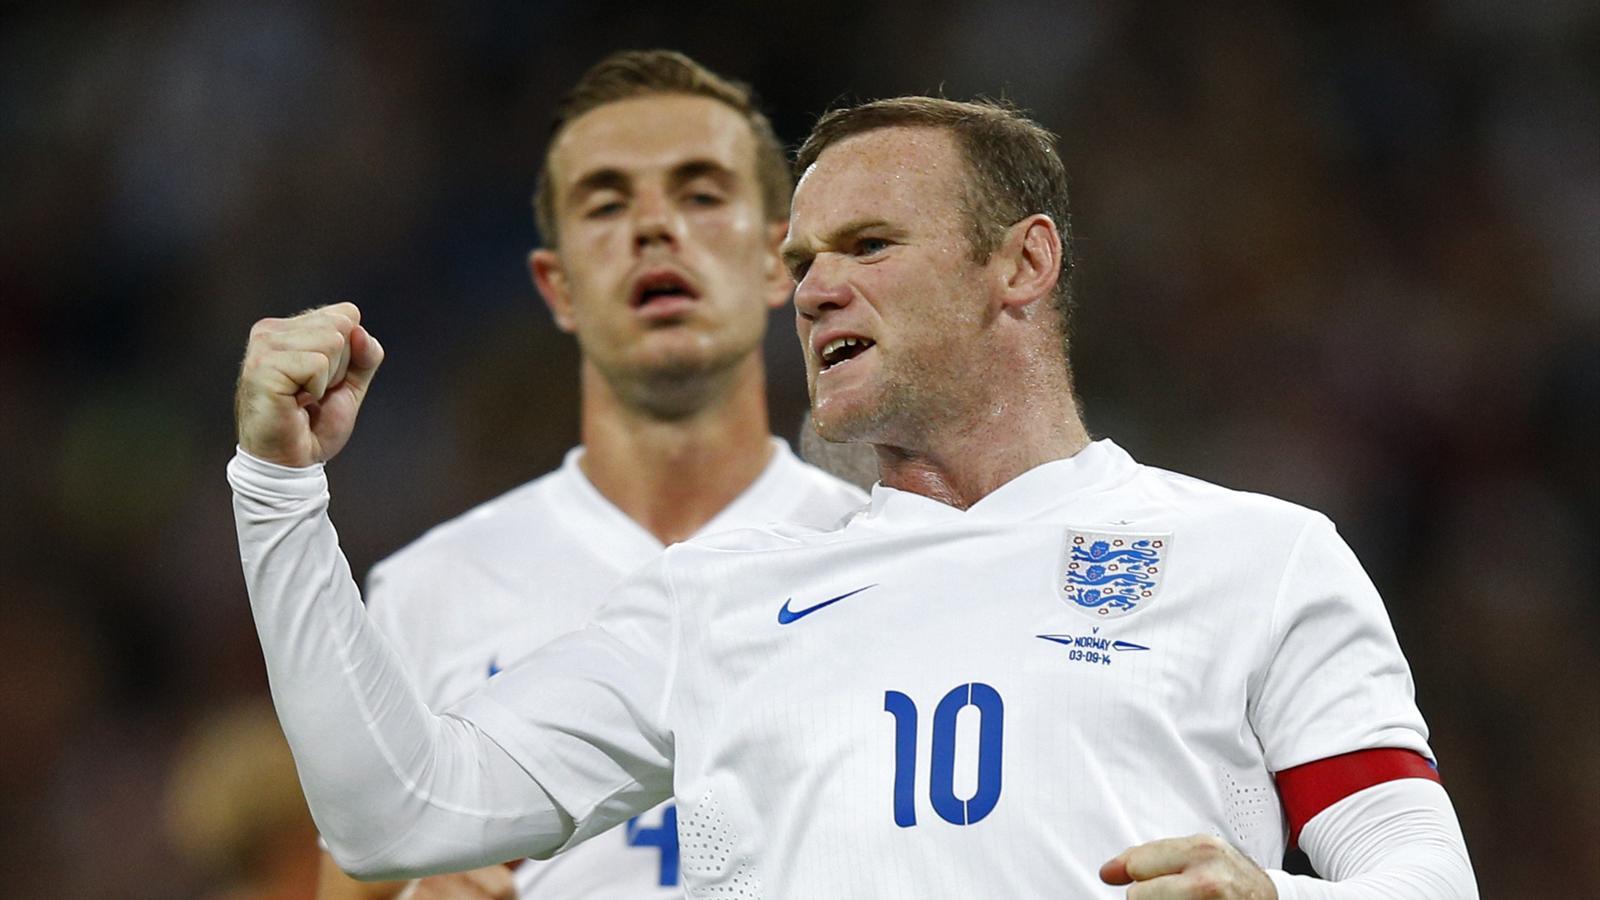 Angleterre - Norvège (1-0) : Les Anglais s